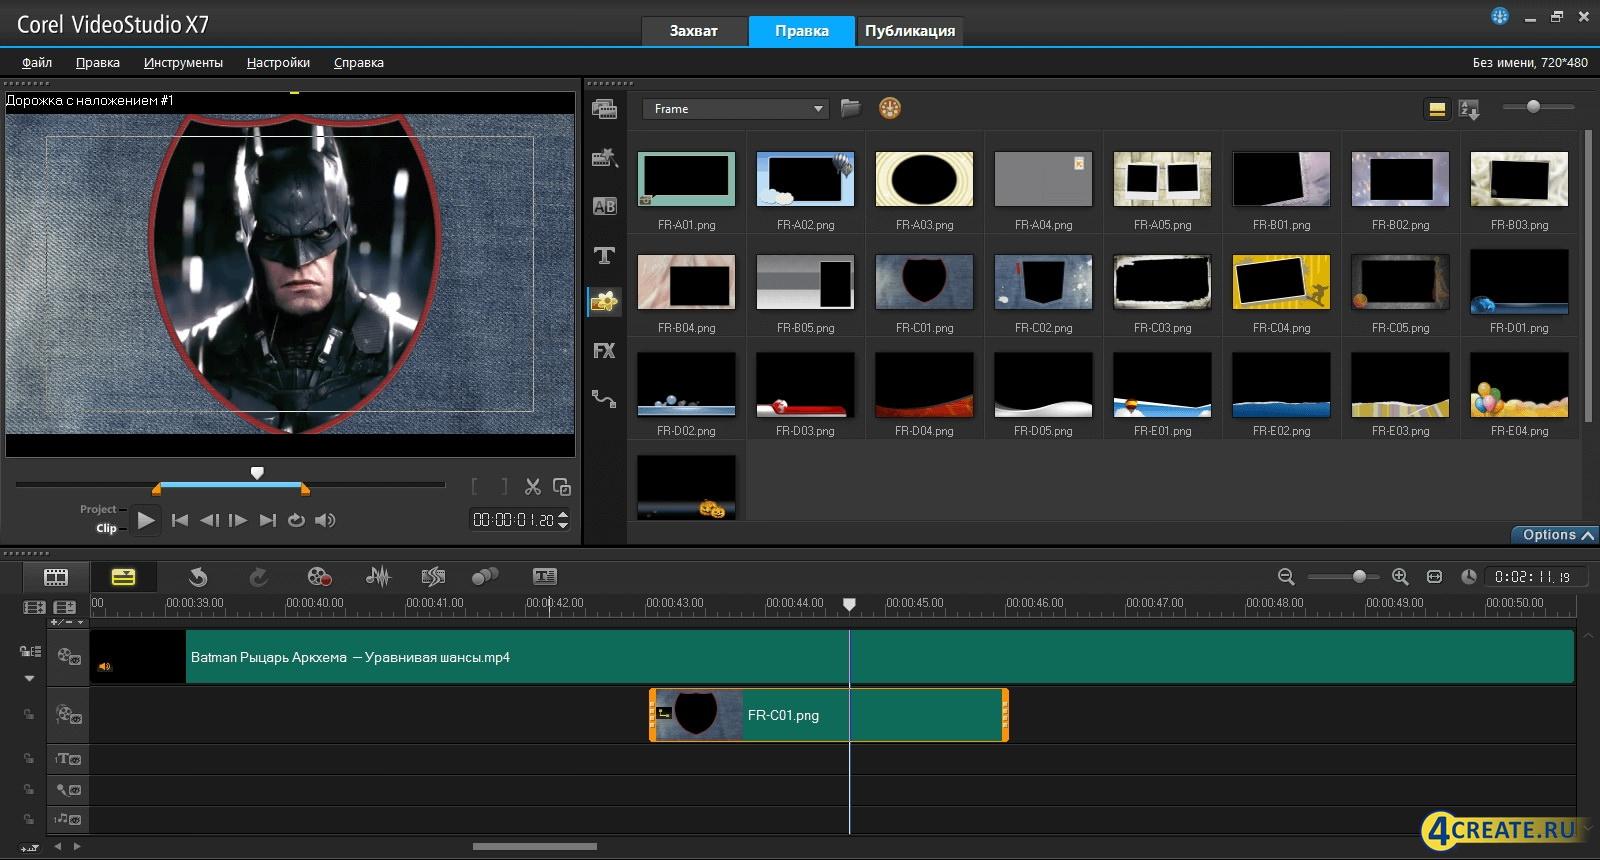 Corel VideoStudio Pro X9 (Скриншот 3)